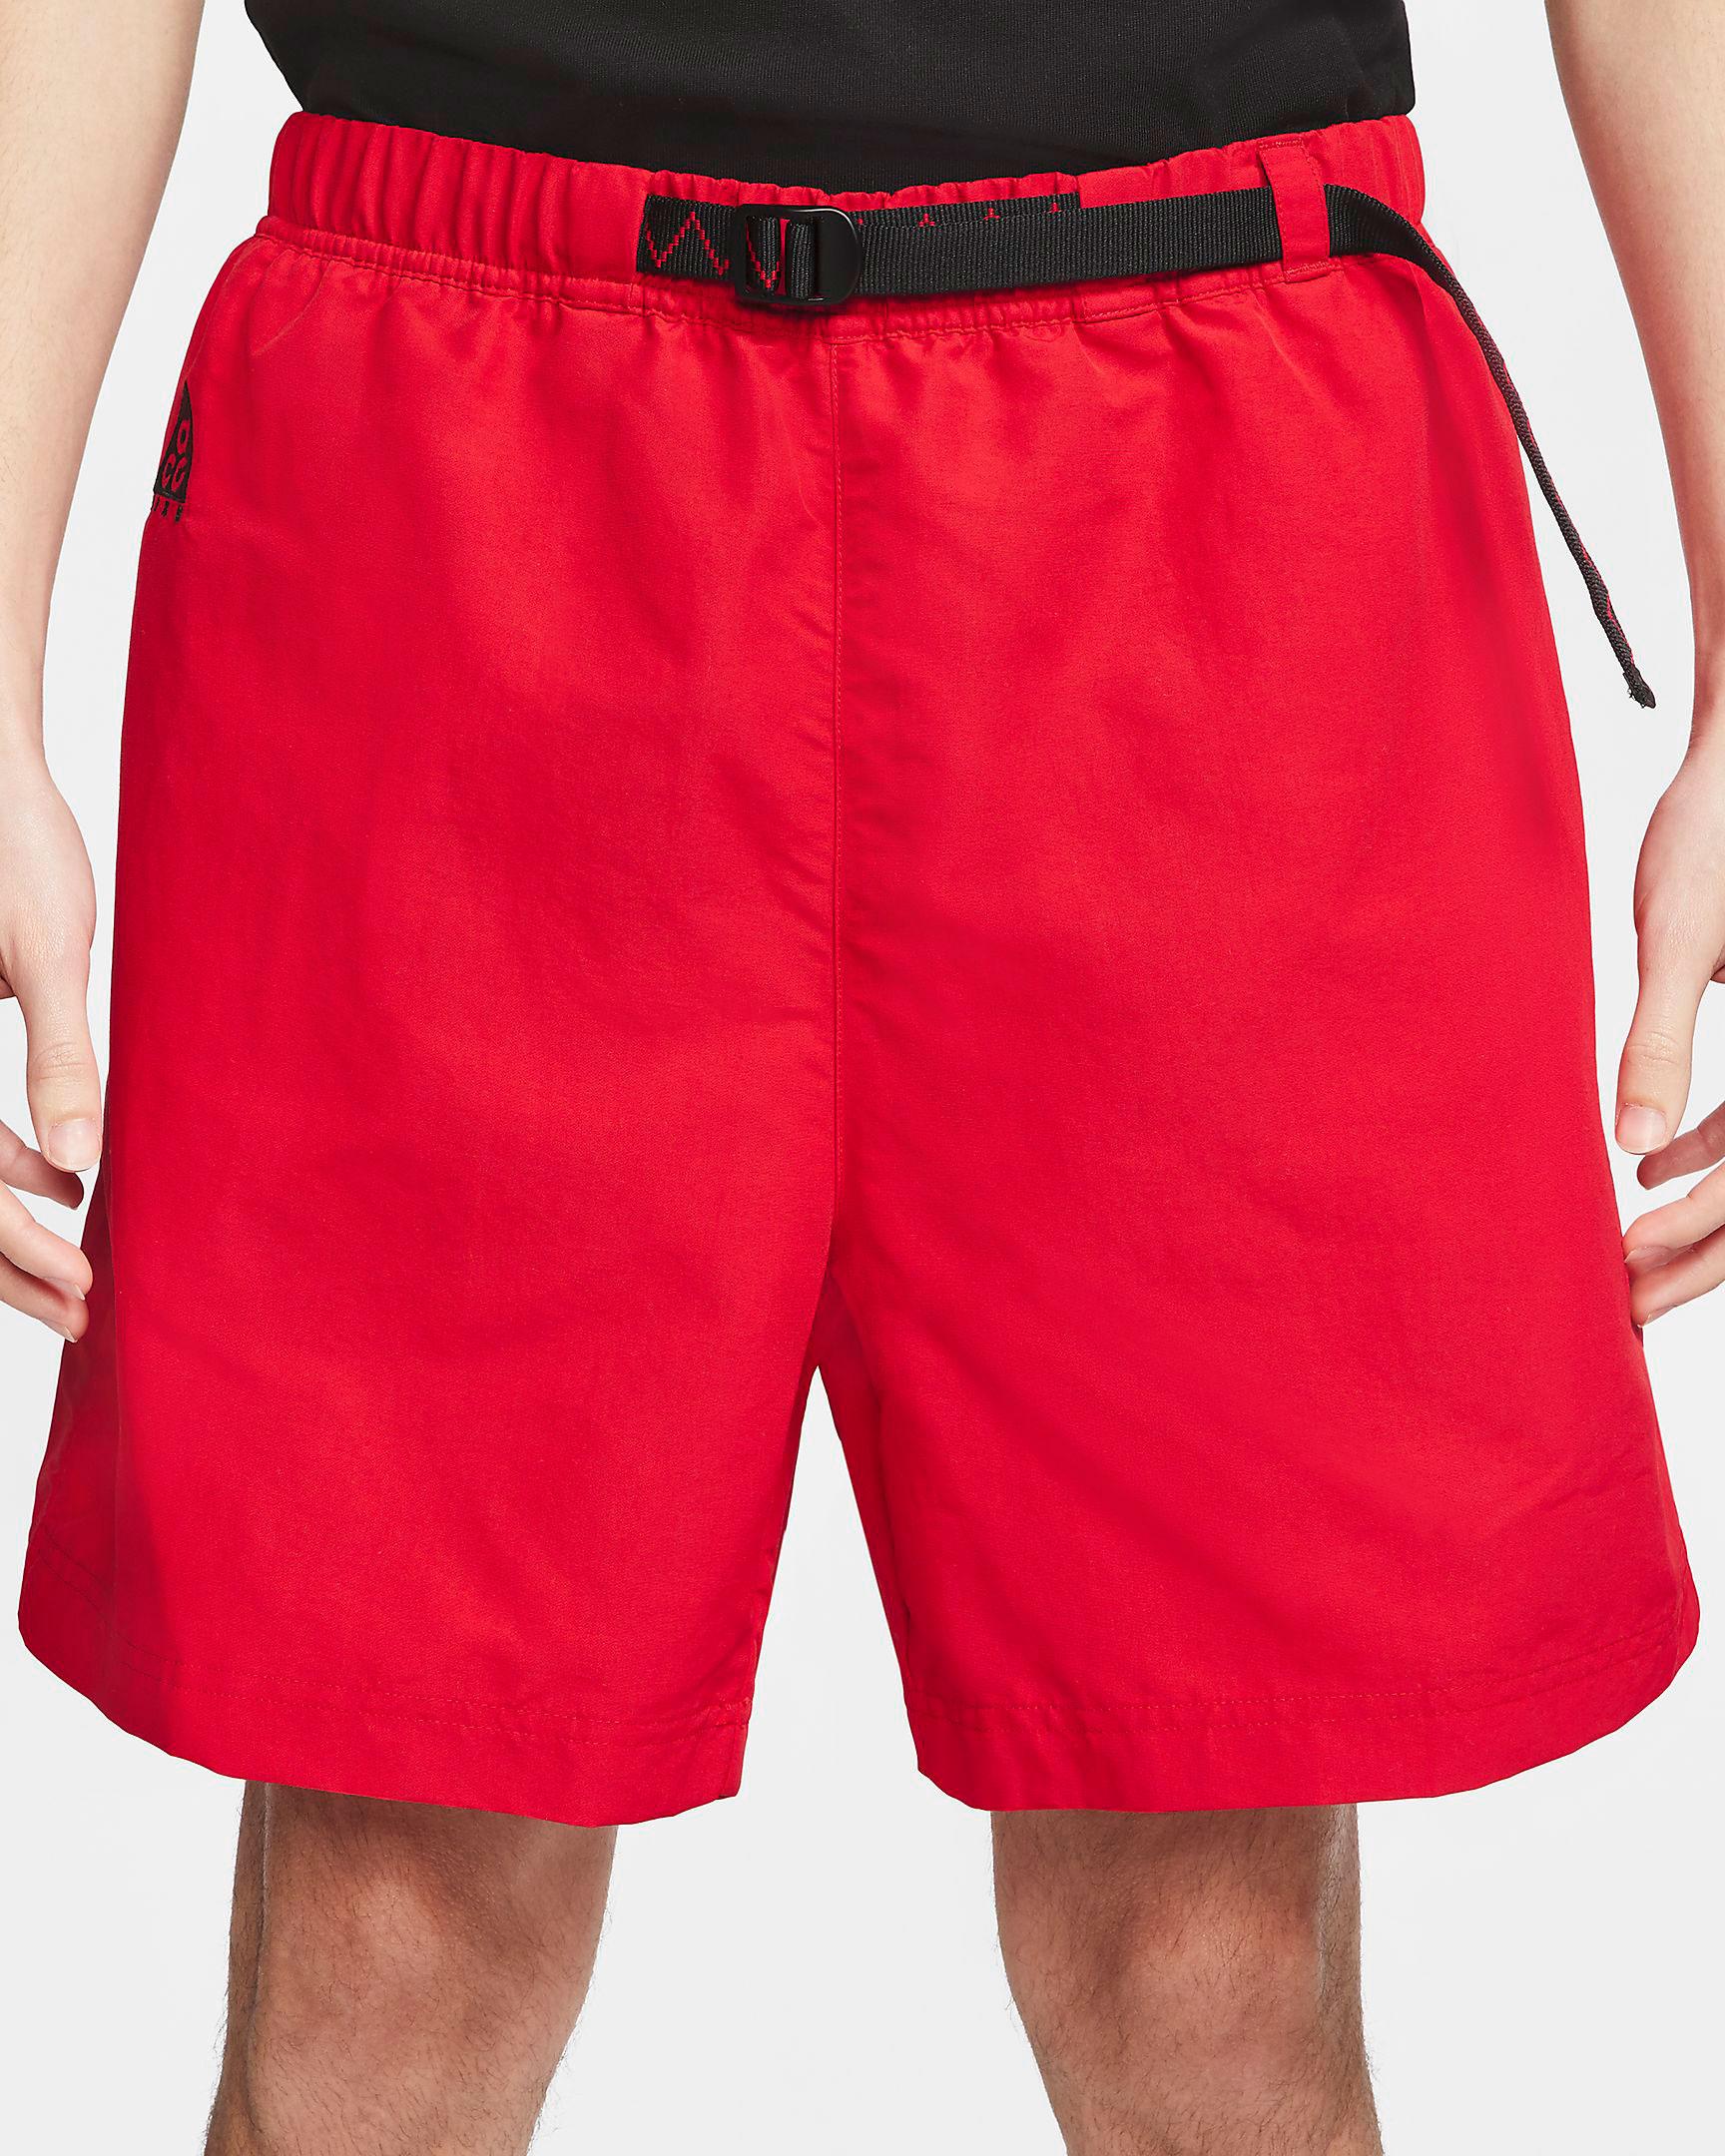 nike-acg-shorts-red